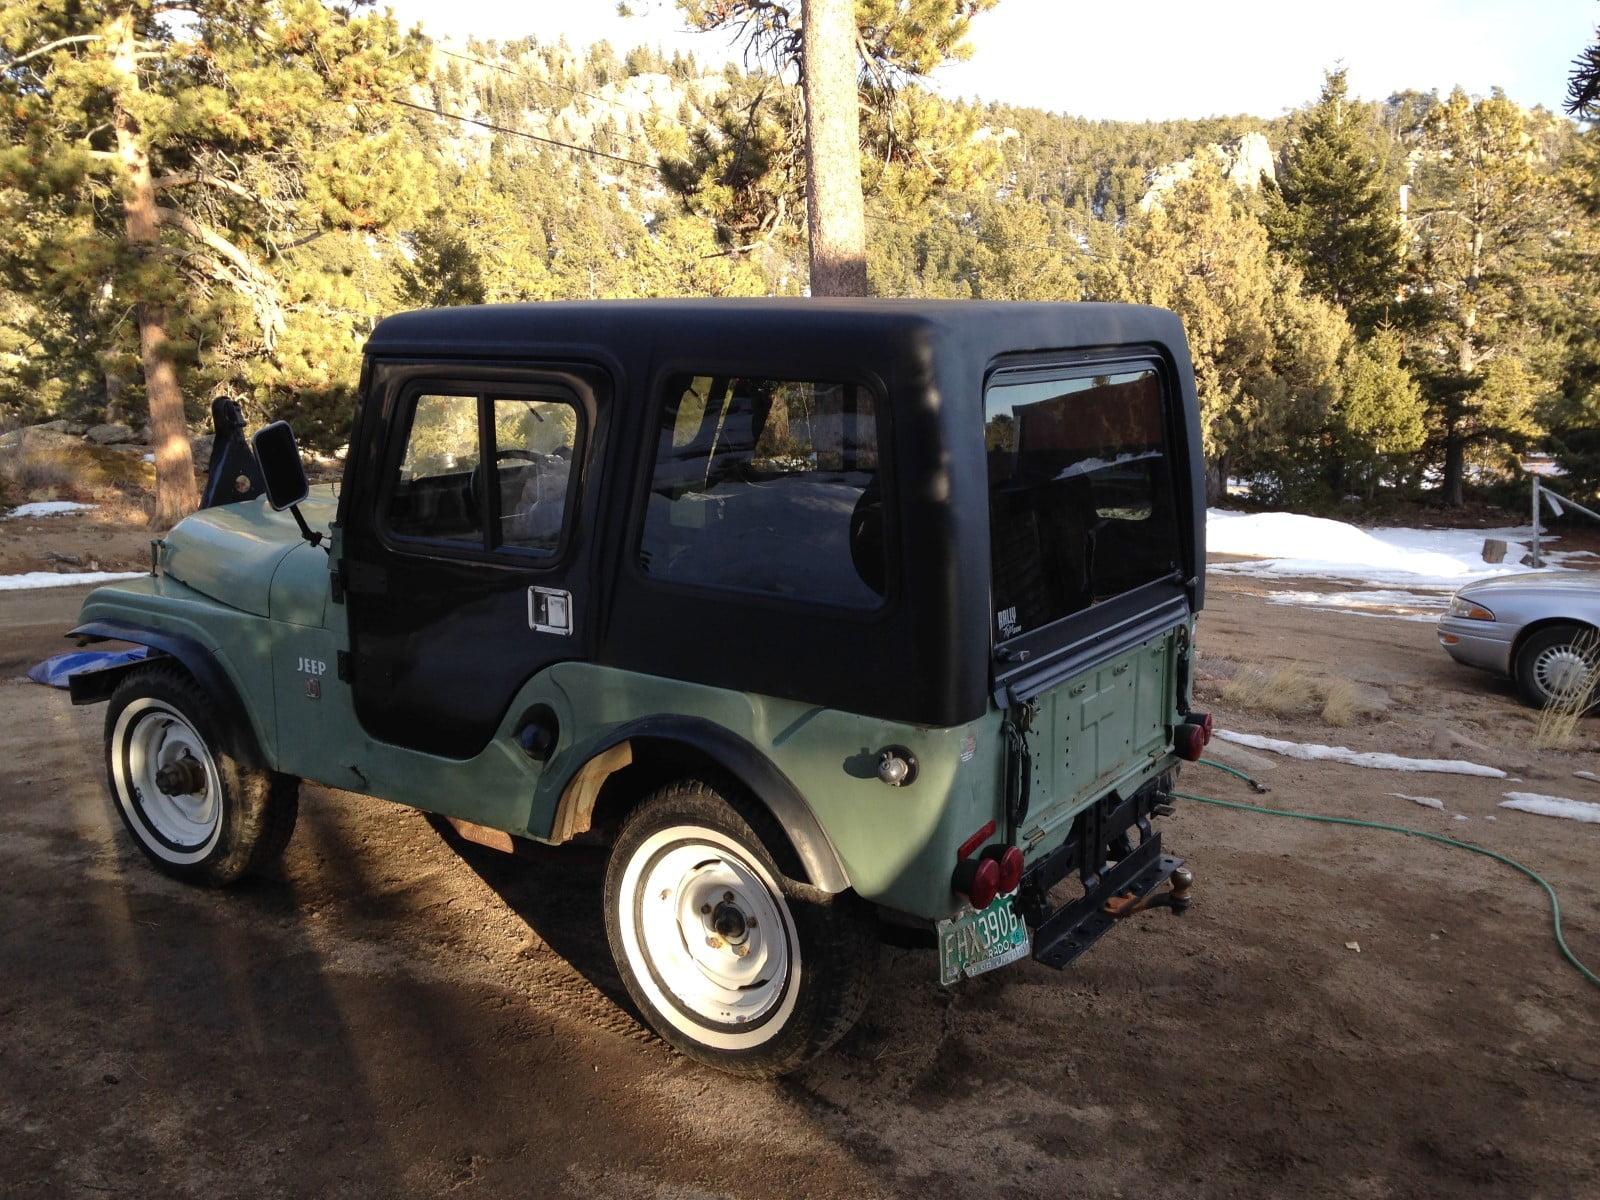 Jeep CJ5 Hardtop 1 Piece Removable Top for 1954-1975 Jeeps